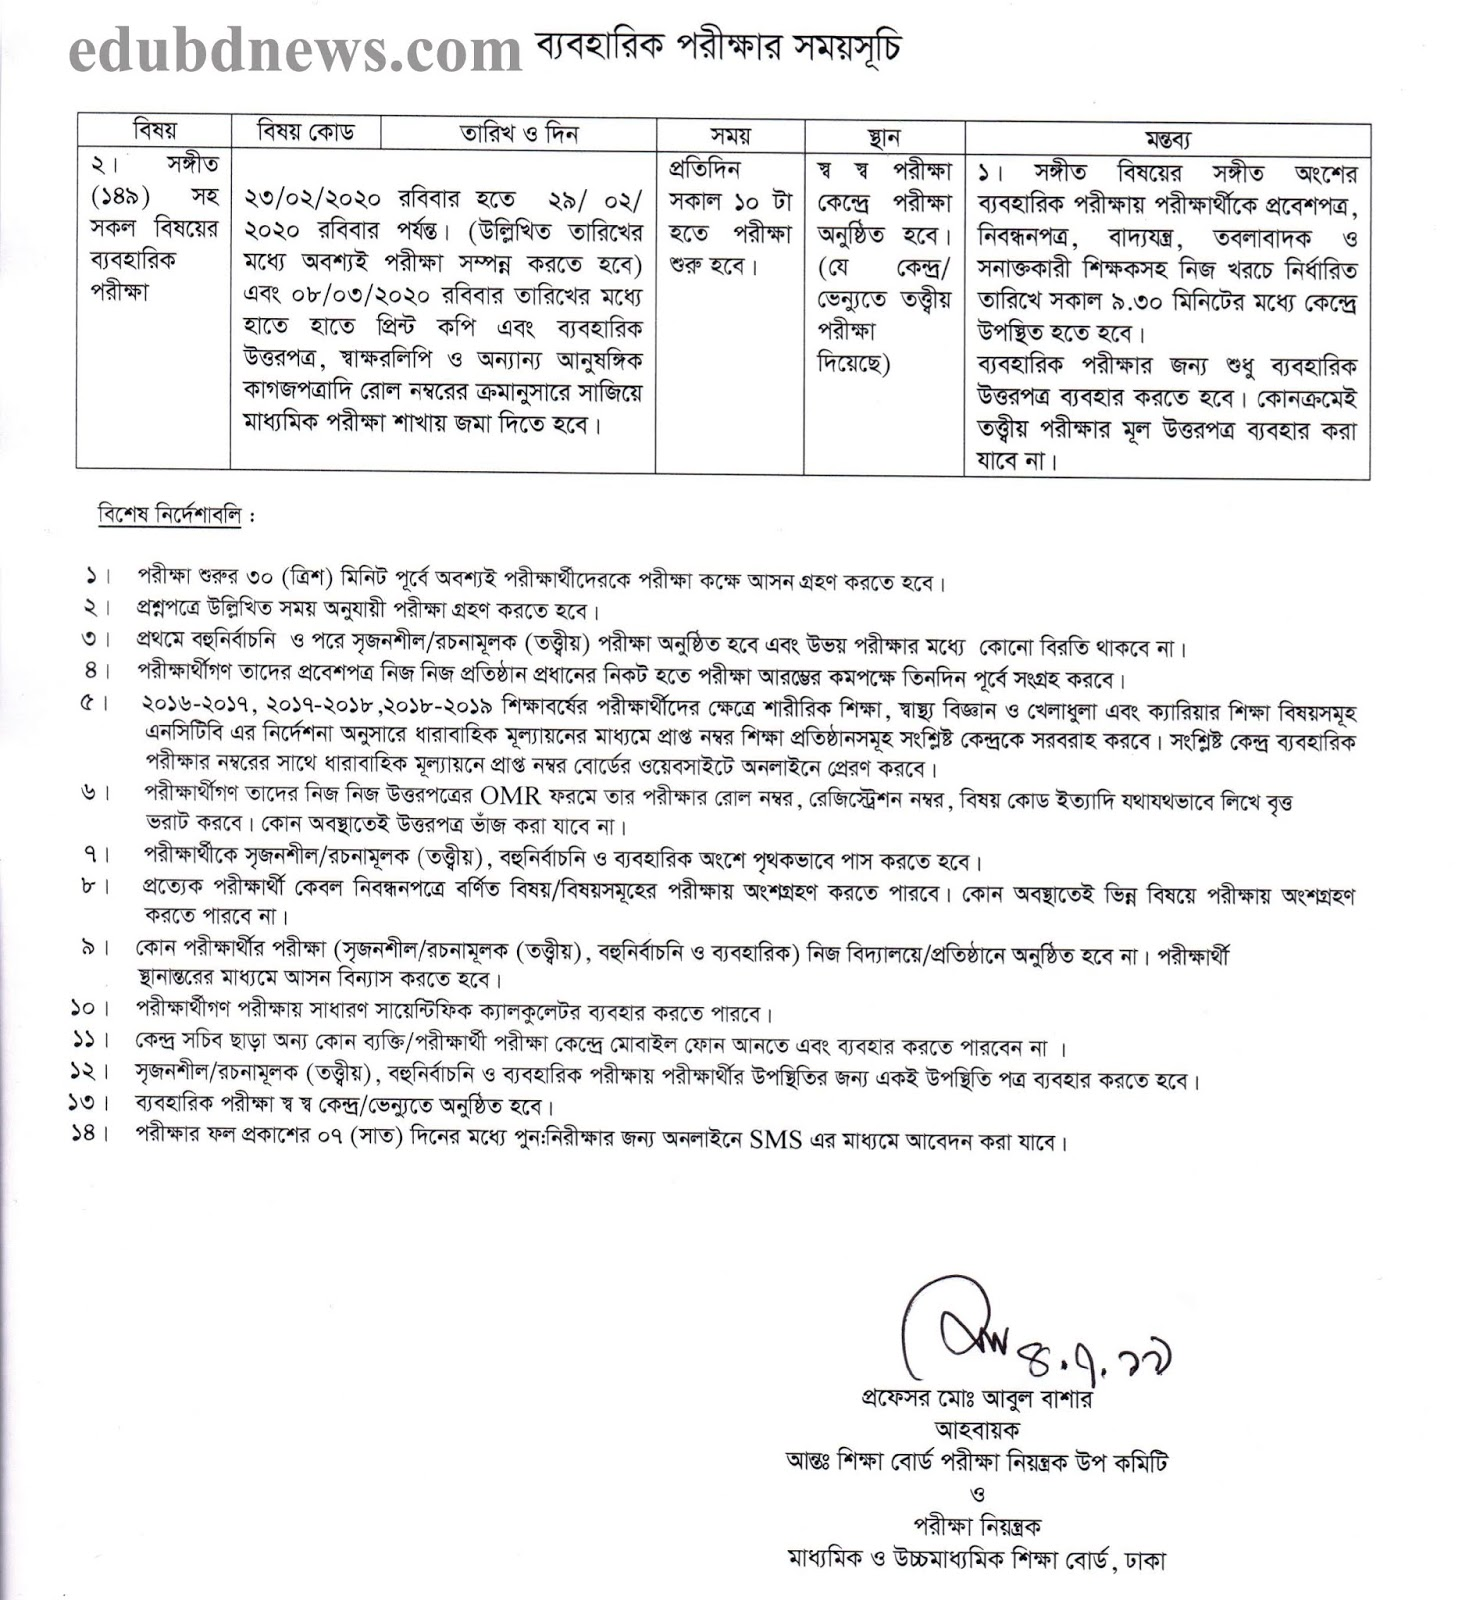 ssc exam routine 2020 PDF download